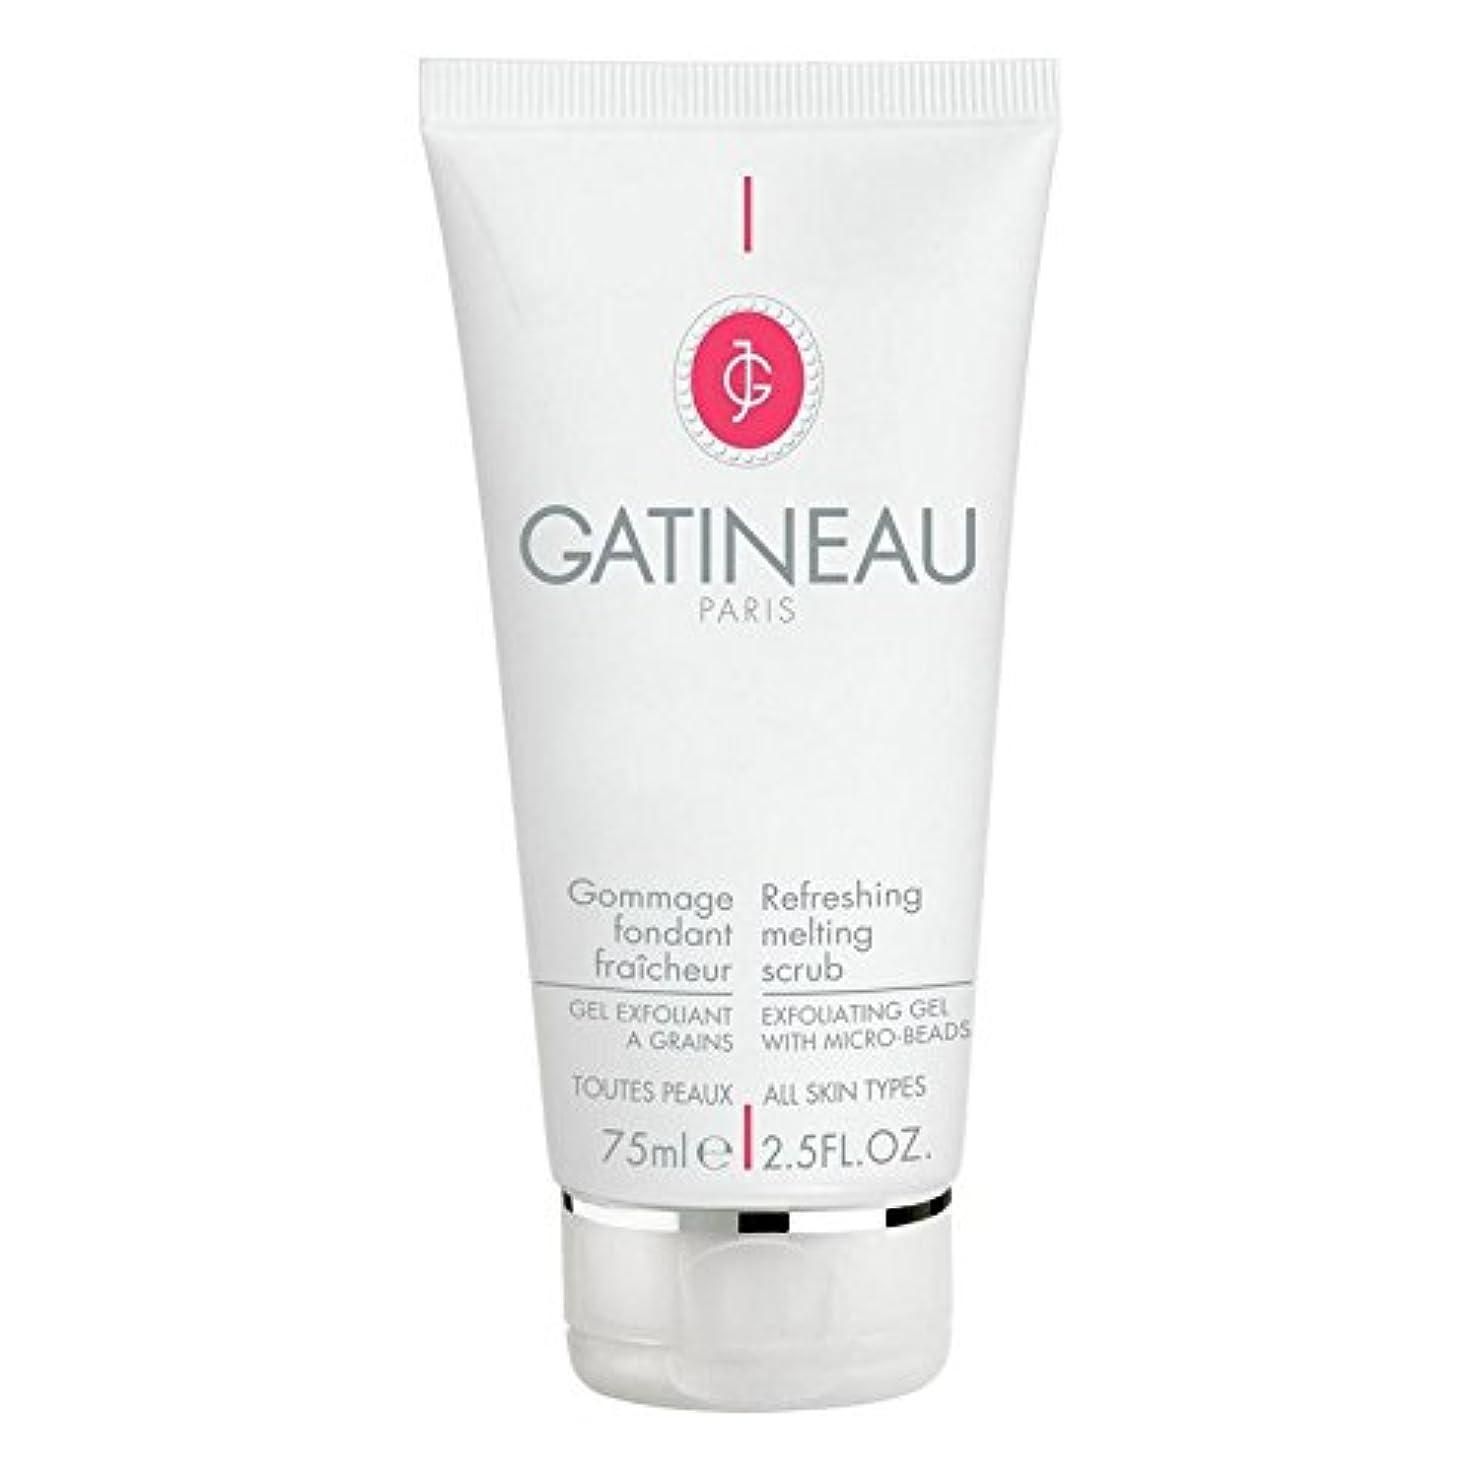 Gatineau Refreshing Melting Scrub 75ml - ガティノーさわやか溶融スクラブ75ミリリットル [並行輸入品]